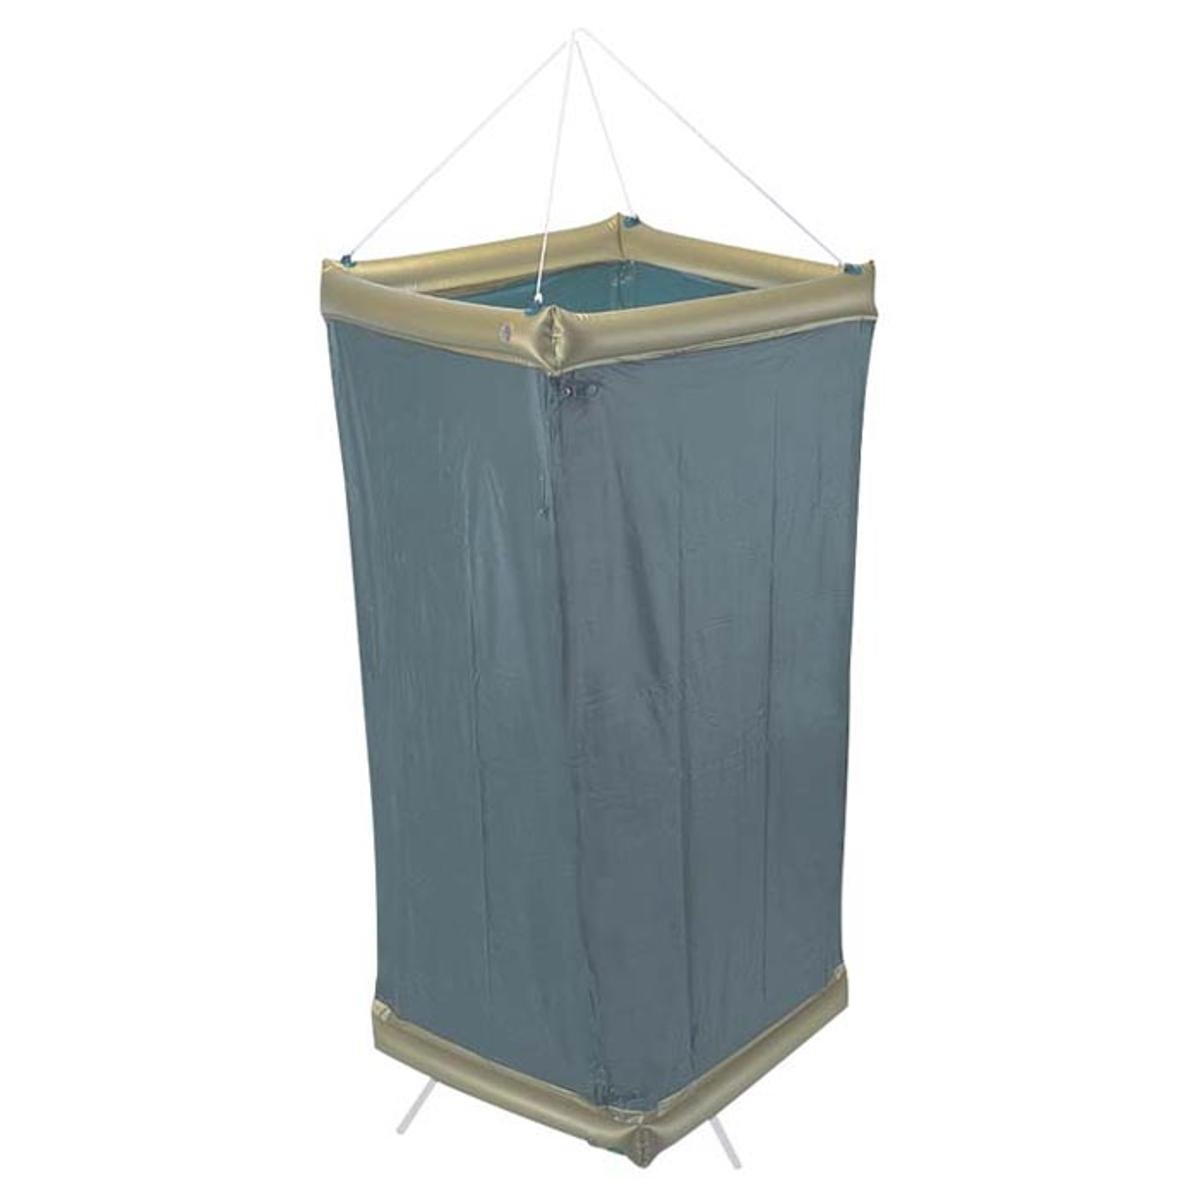 Amazon.com : Stearns Sunshower Enclosure : Camping Sanitation ...